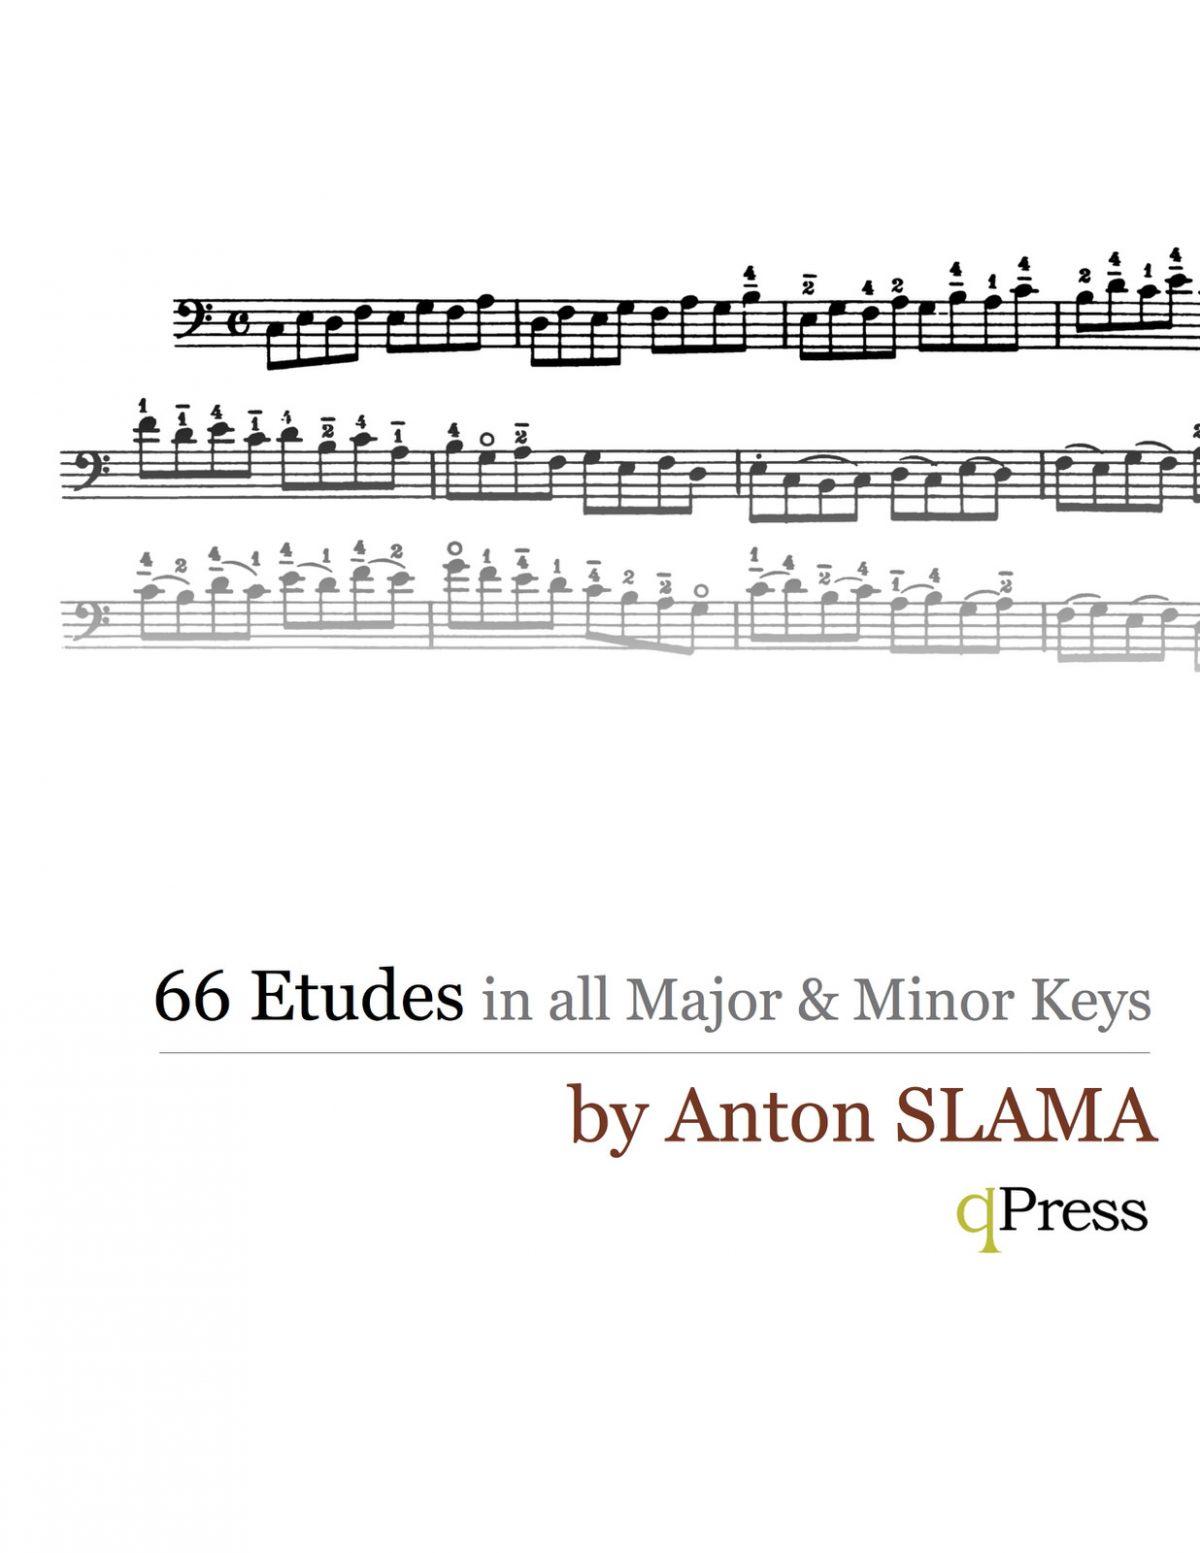 Slama, 66 Etudes in all Major and Minor Keys for Trombone, Tuba, Bassoon String Bass